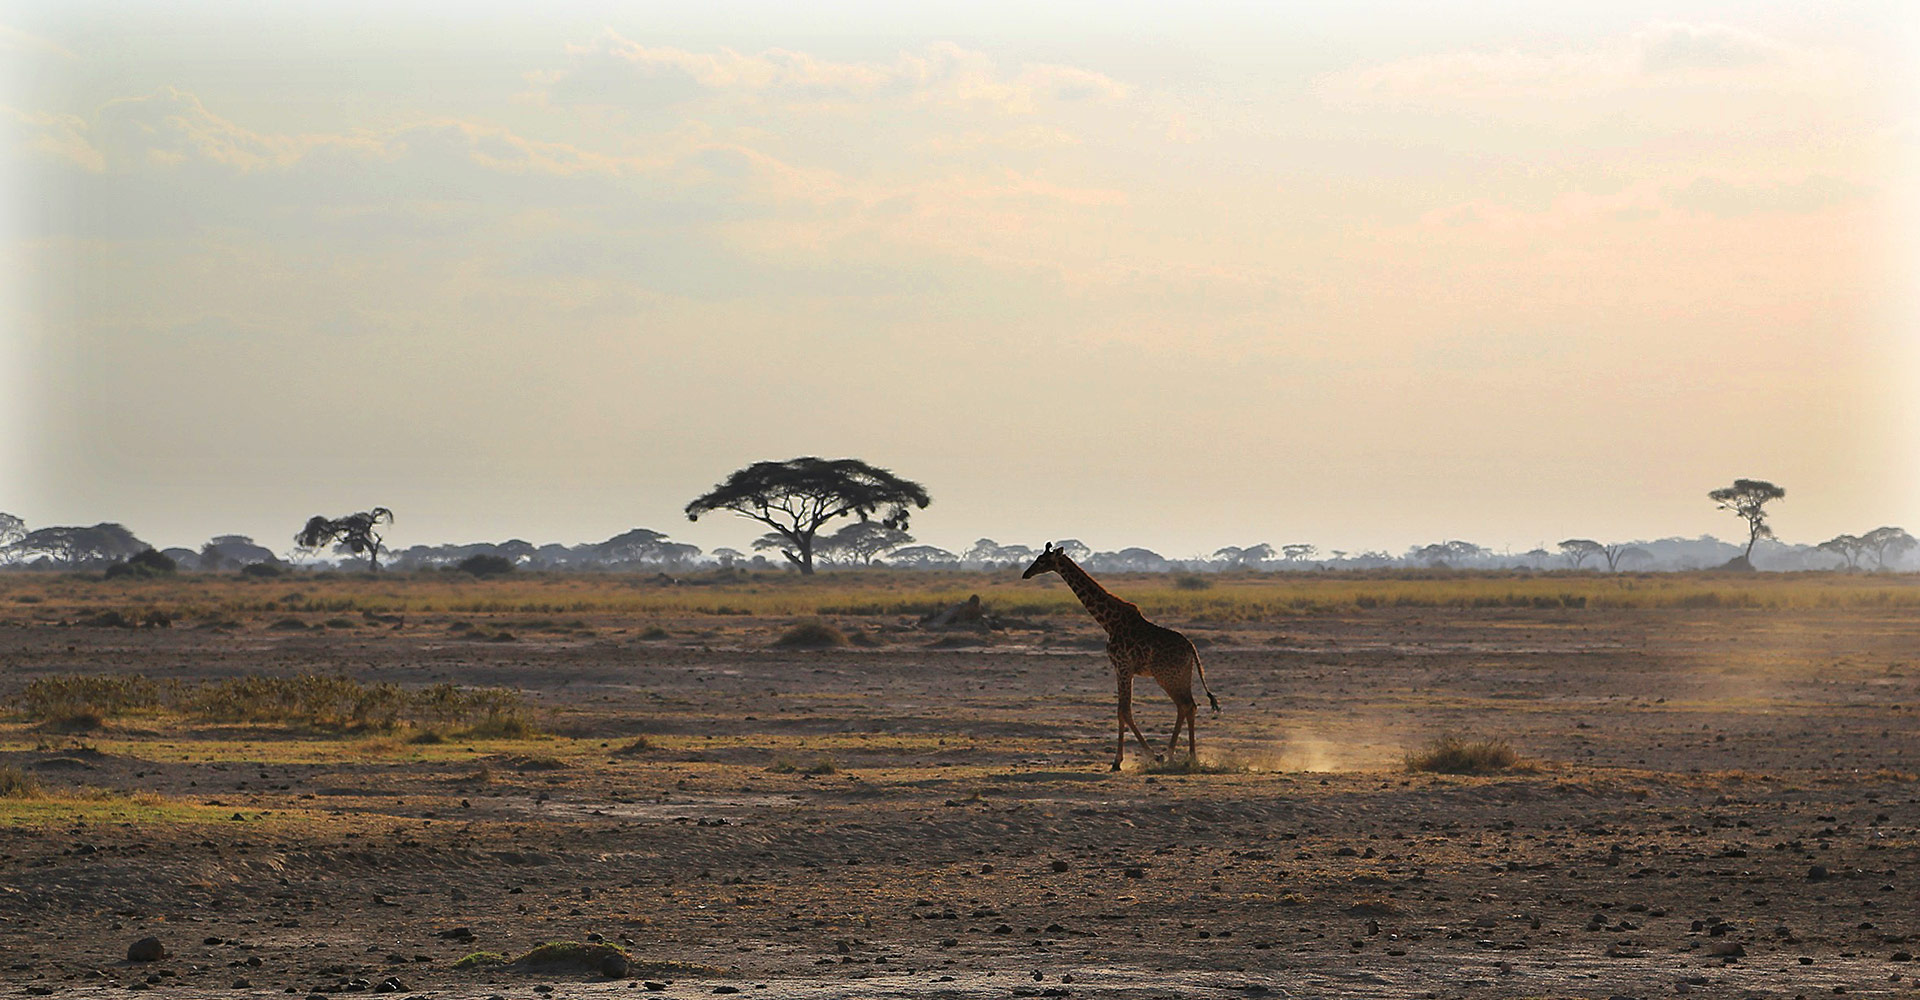 Giraffe in Kenia, Amboseli Nationalpark